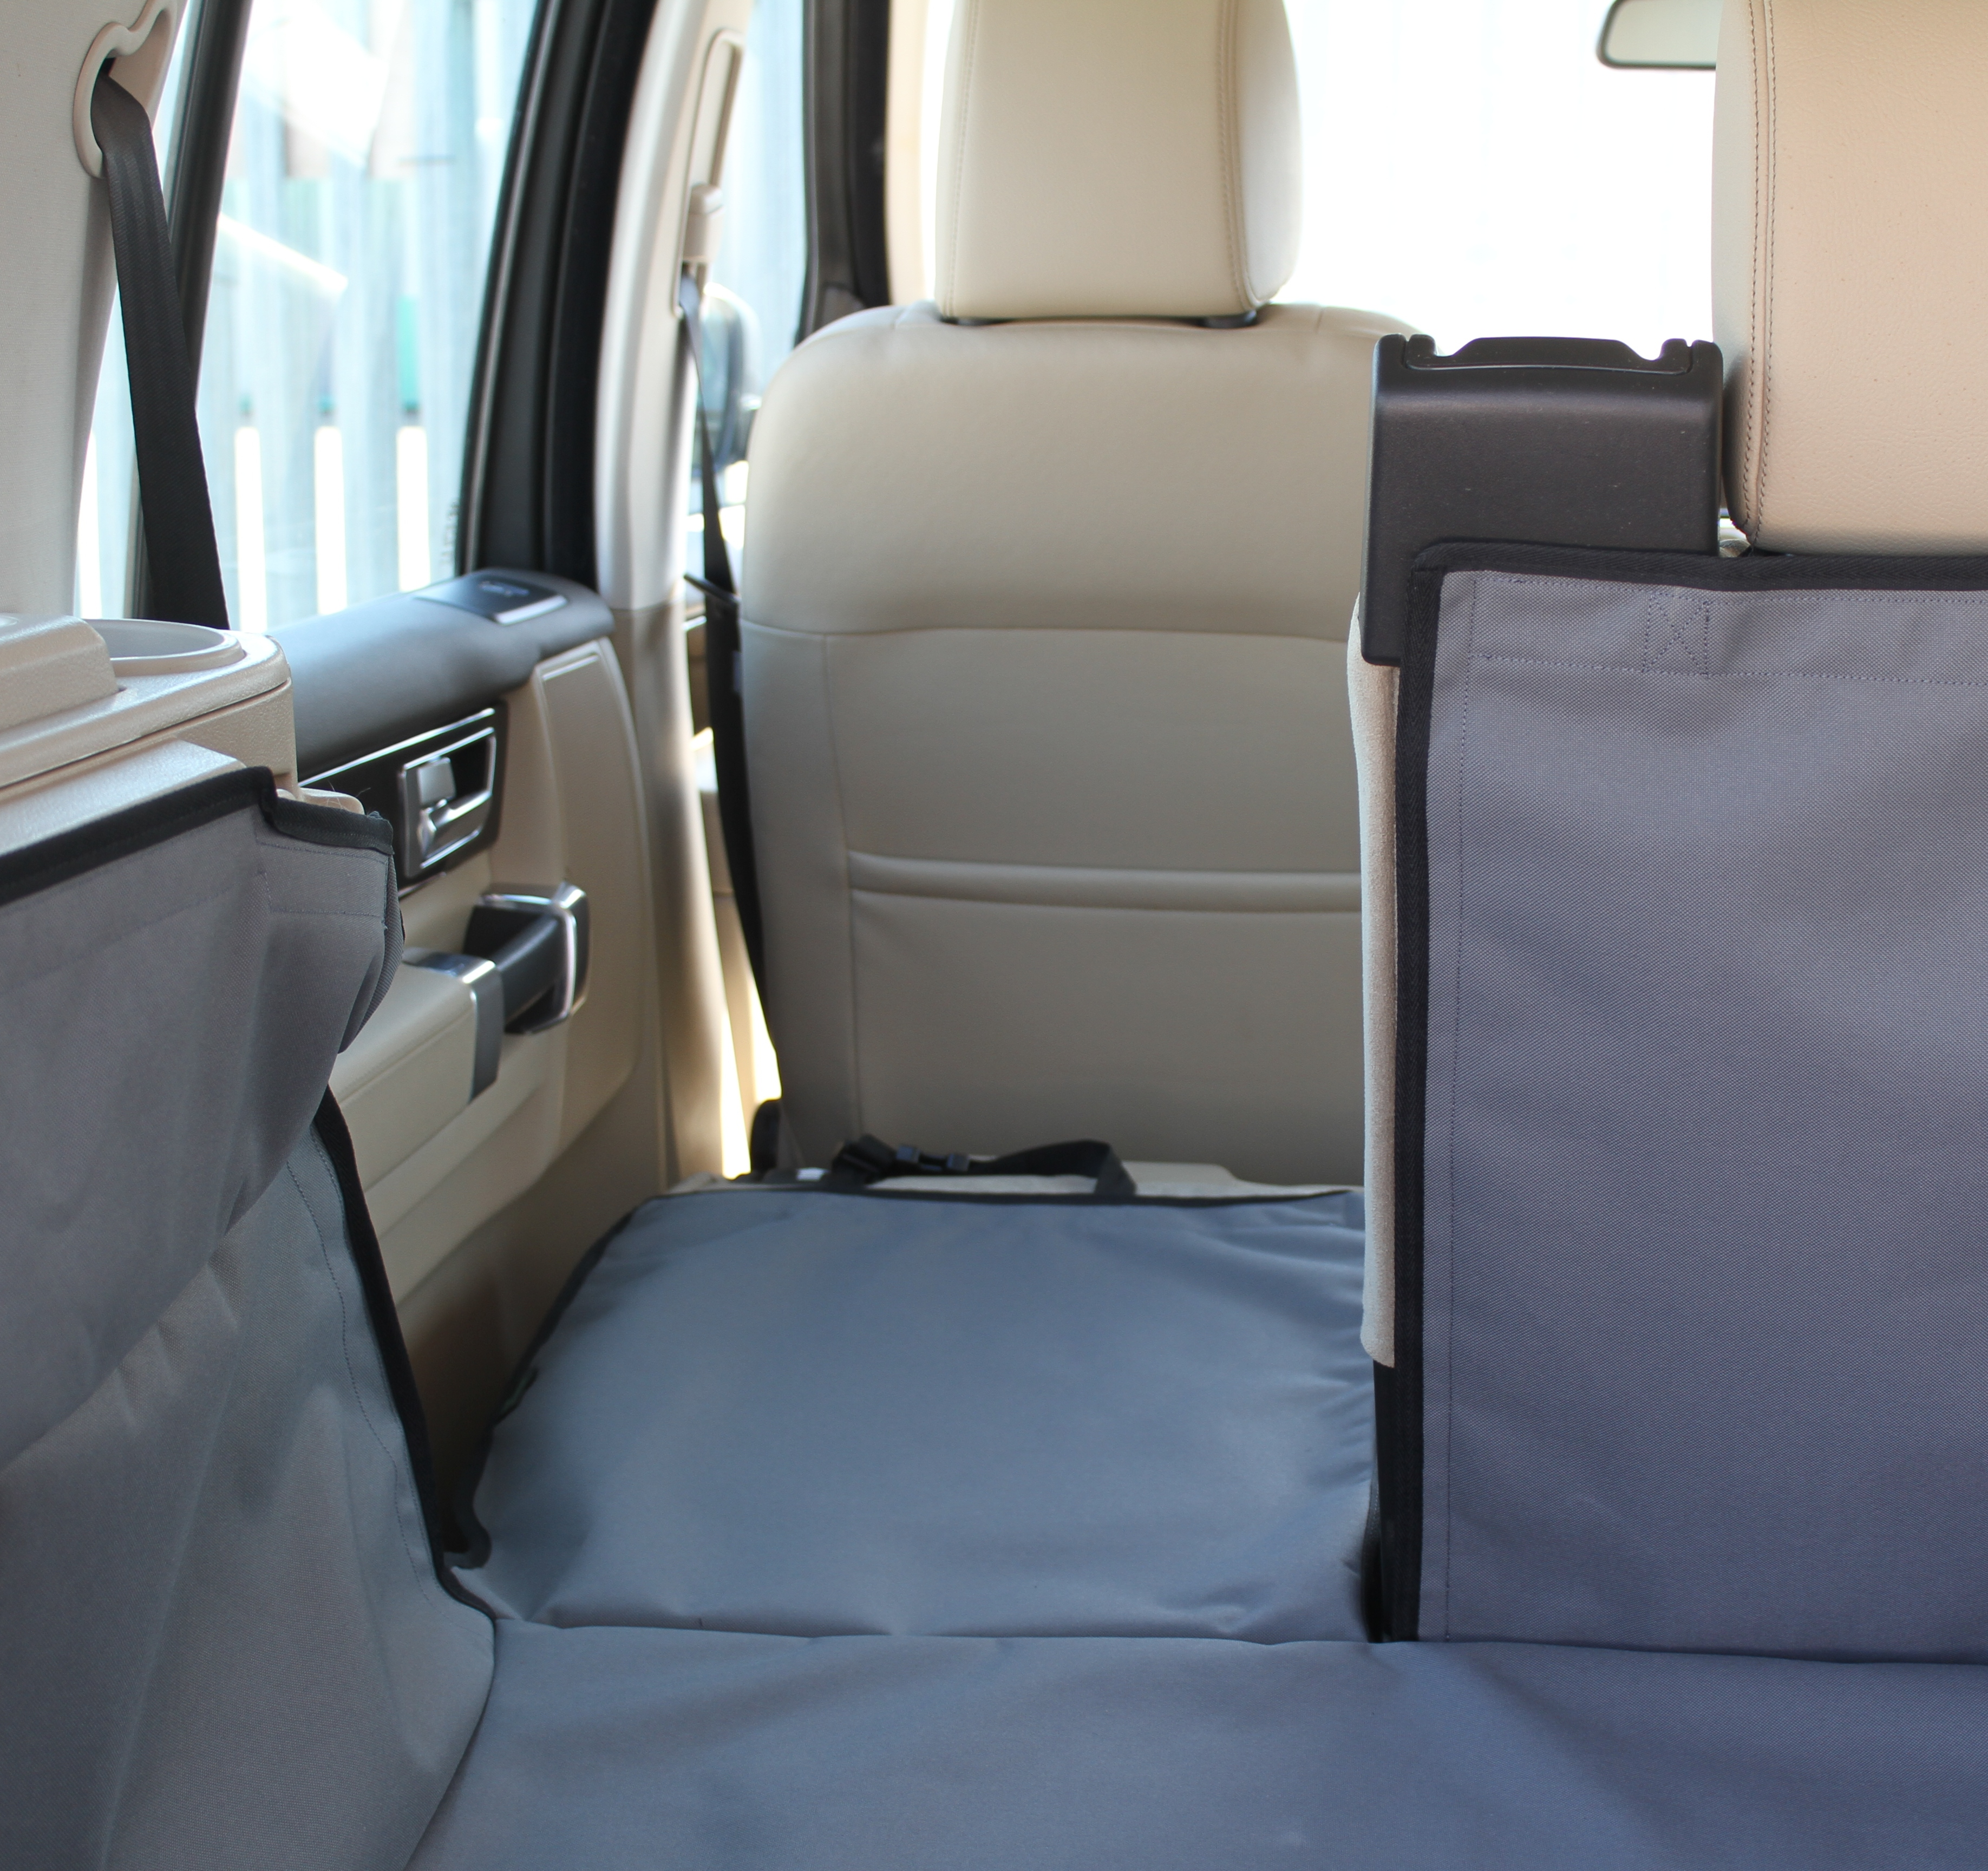 Mazda-3-maletero-2009-forro-de-arranque-personalizado-2014